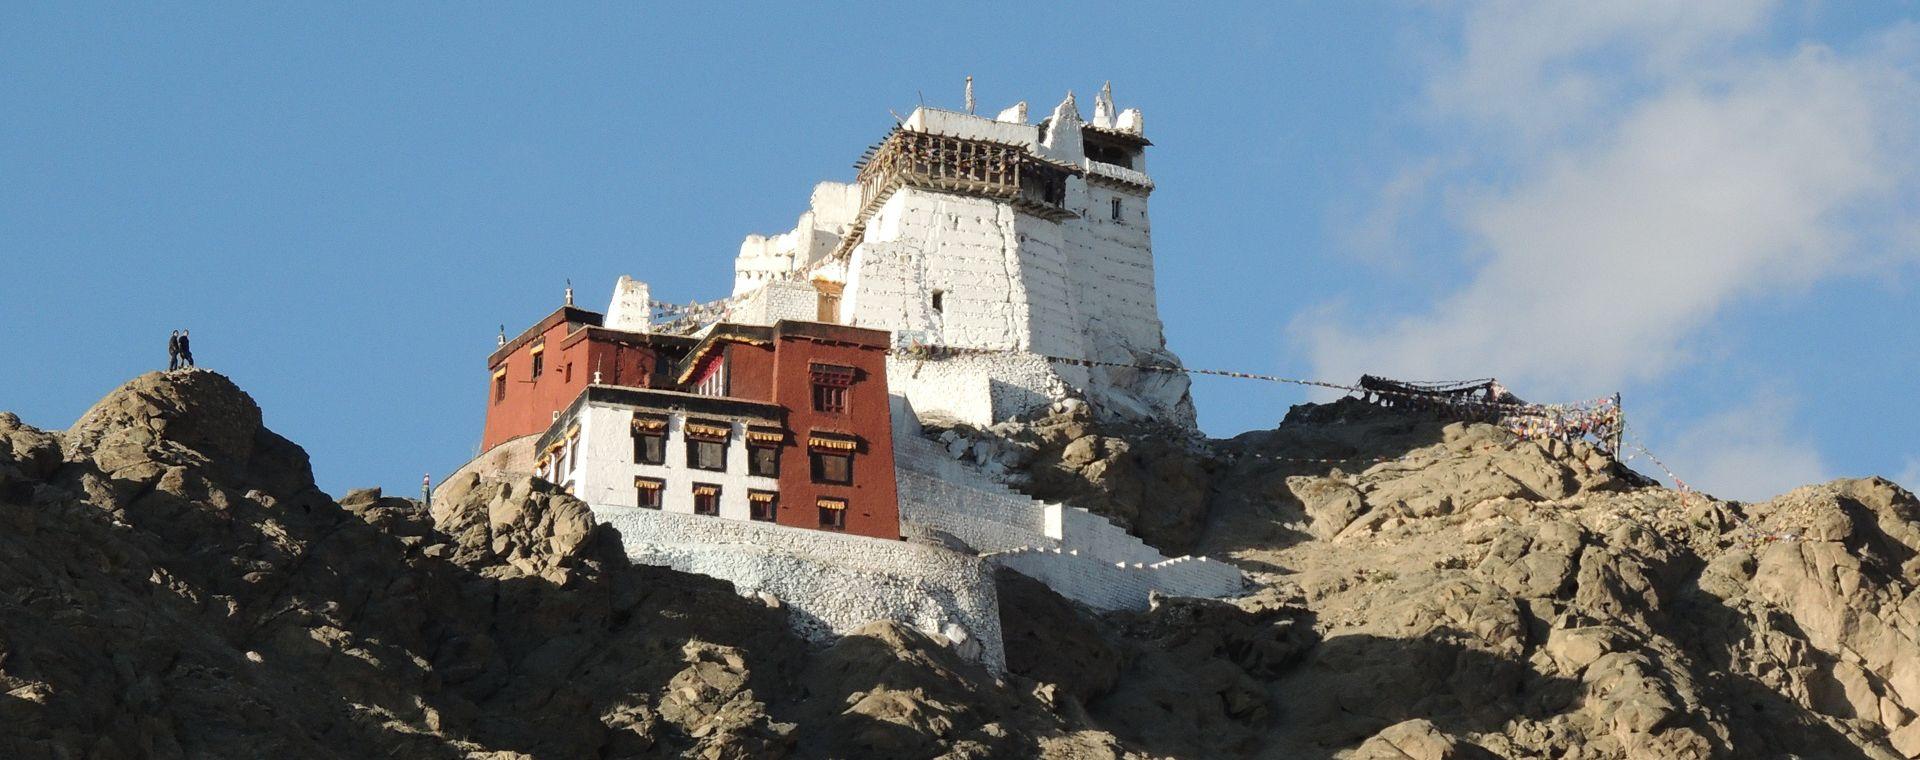 Image Inde : balade au Ladakh et au Zanskar